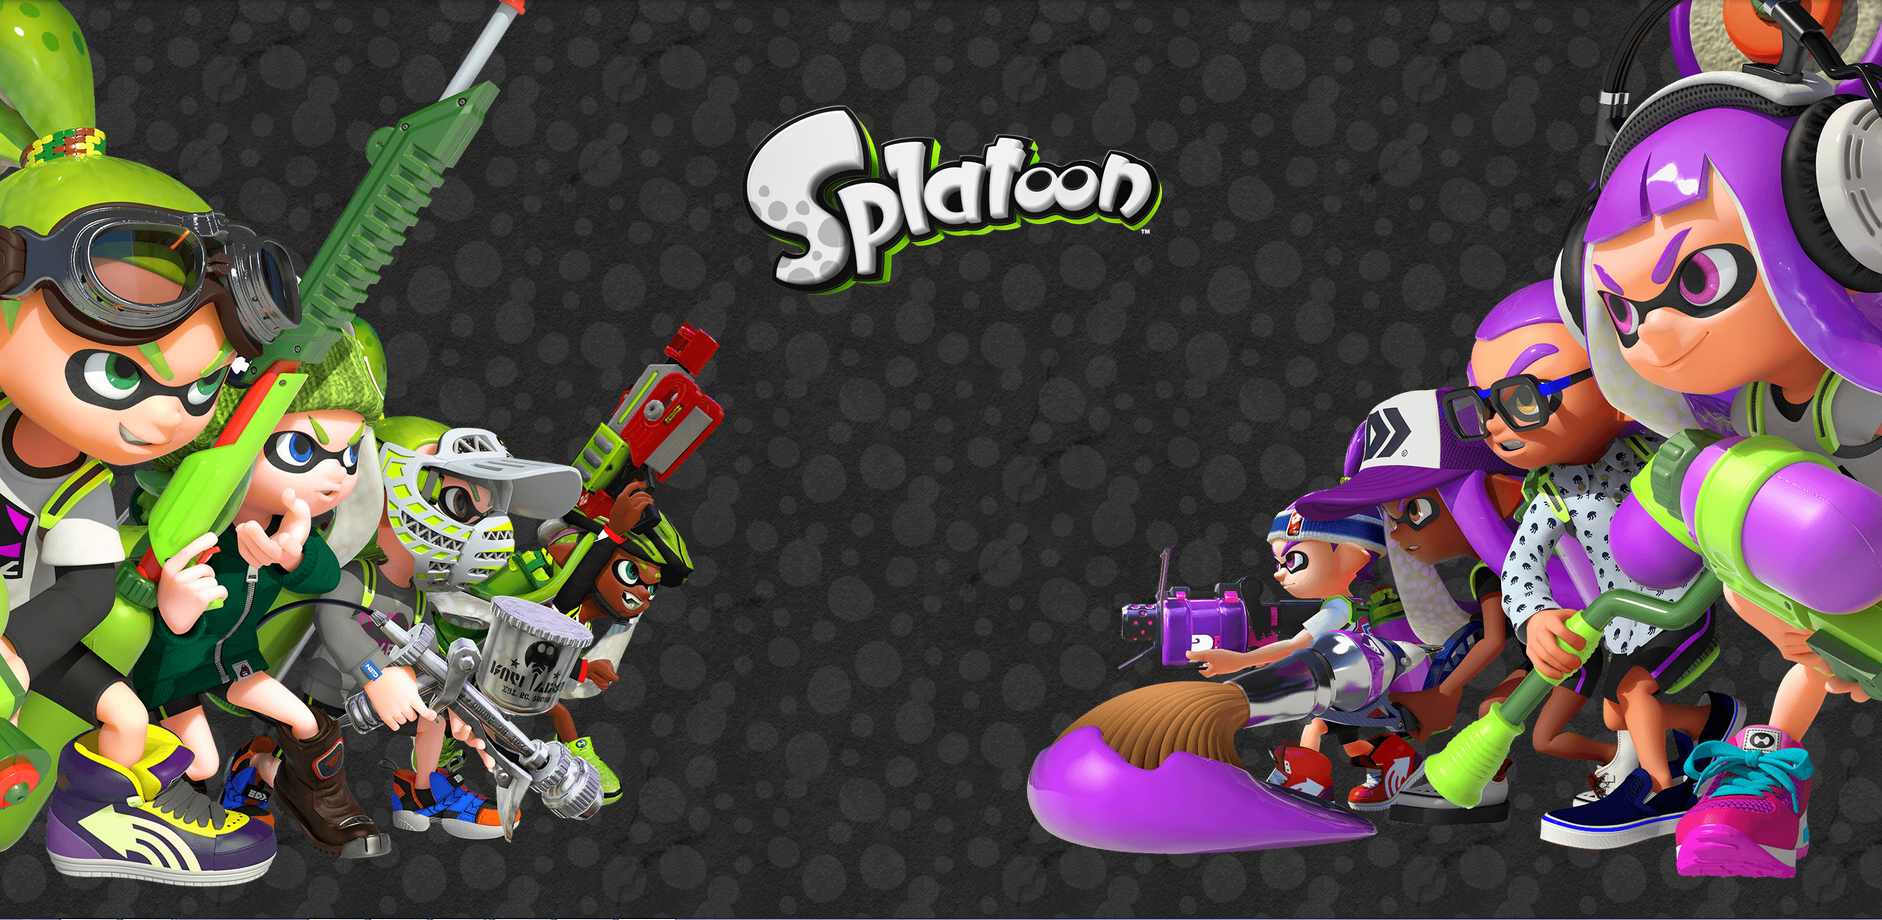 Splatoon Wallpaper by sonictom2 on DeviantArt